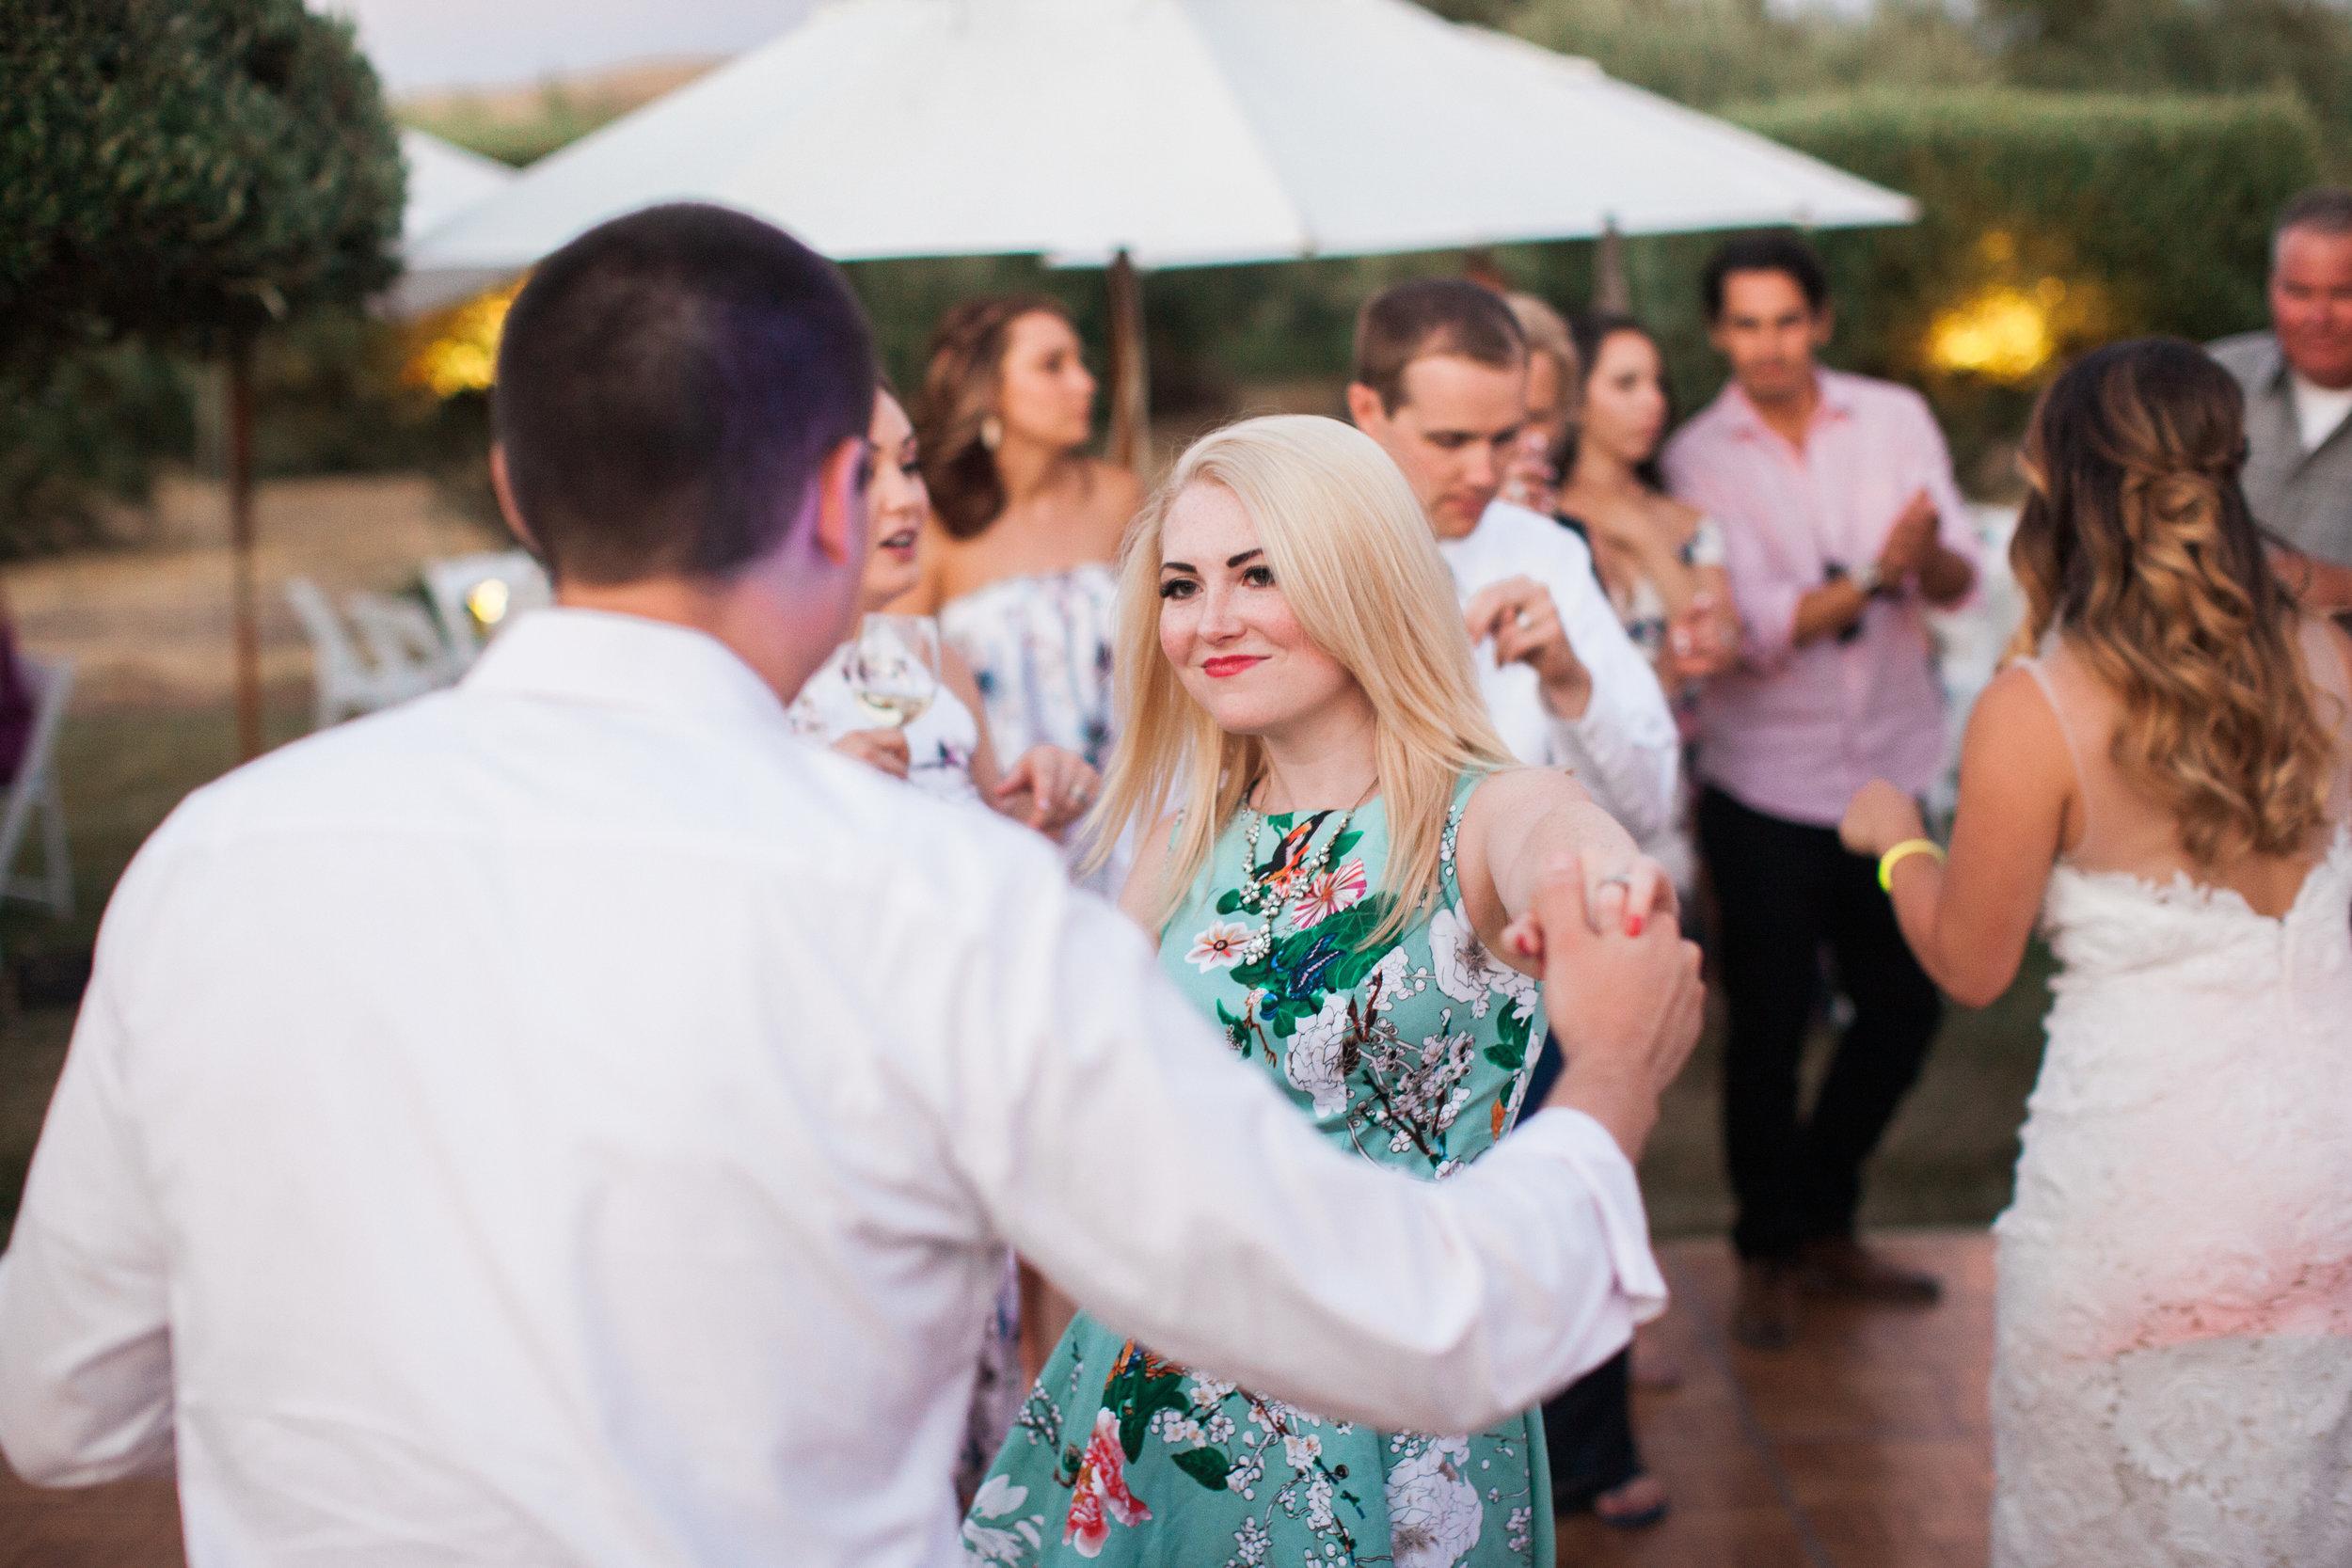 the-purple-orchid-resort-wedding-in-livermore-california-34.jpg